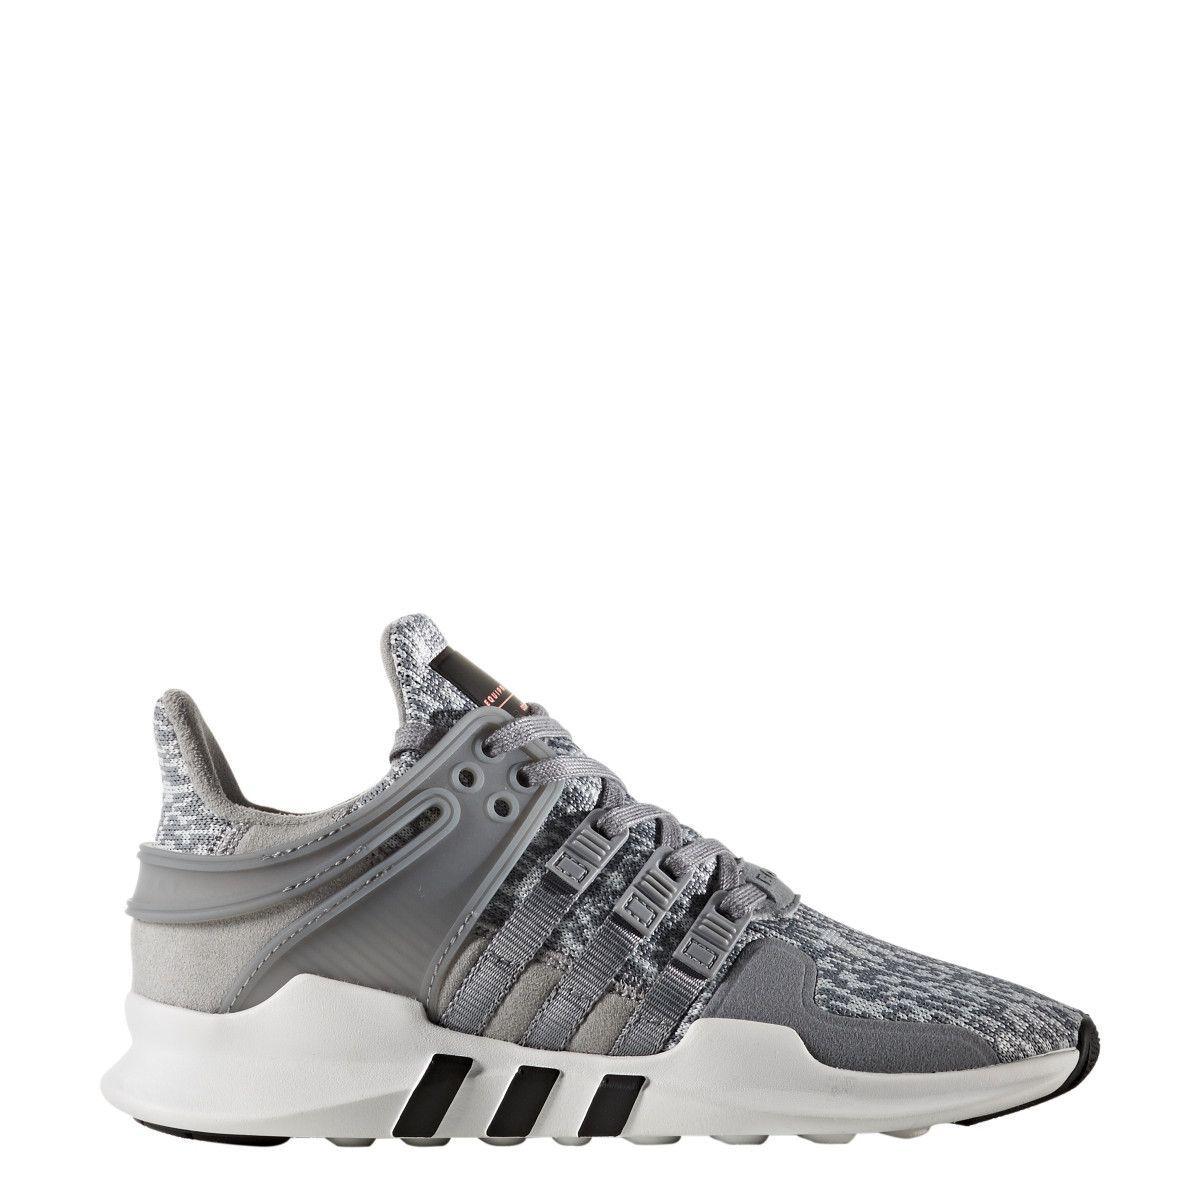 3b6944c85cec Adidas eqt support adv kids sneakers